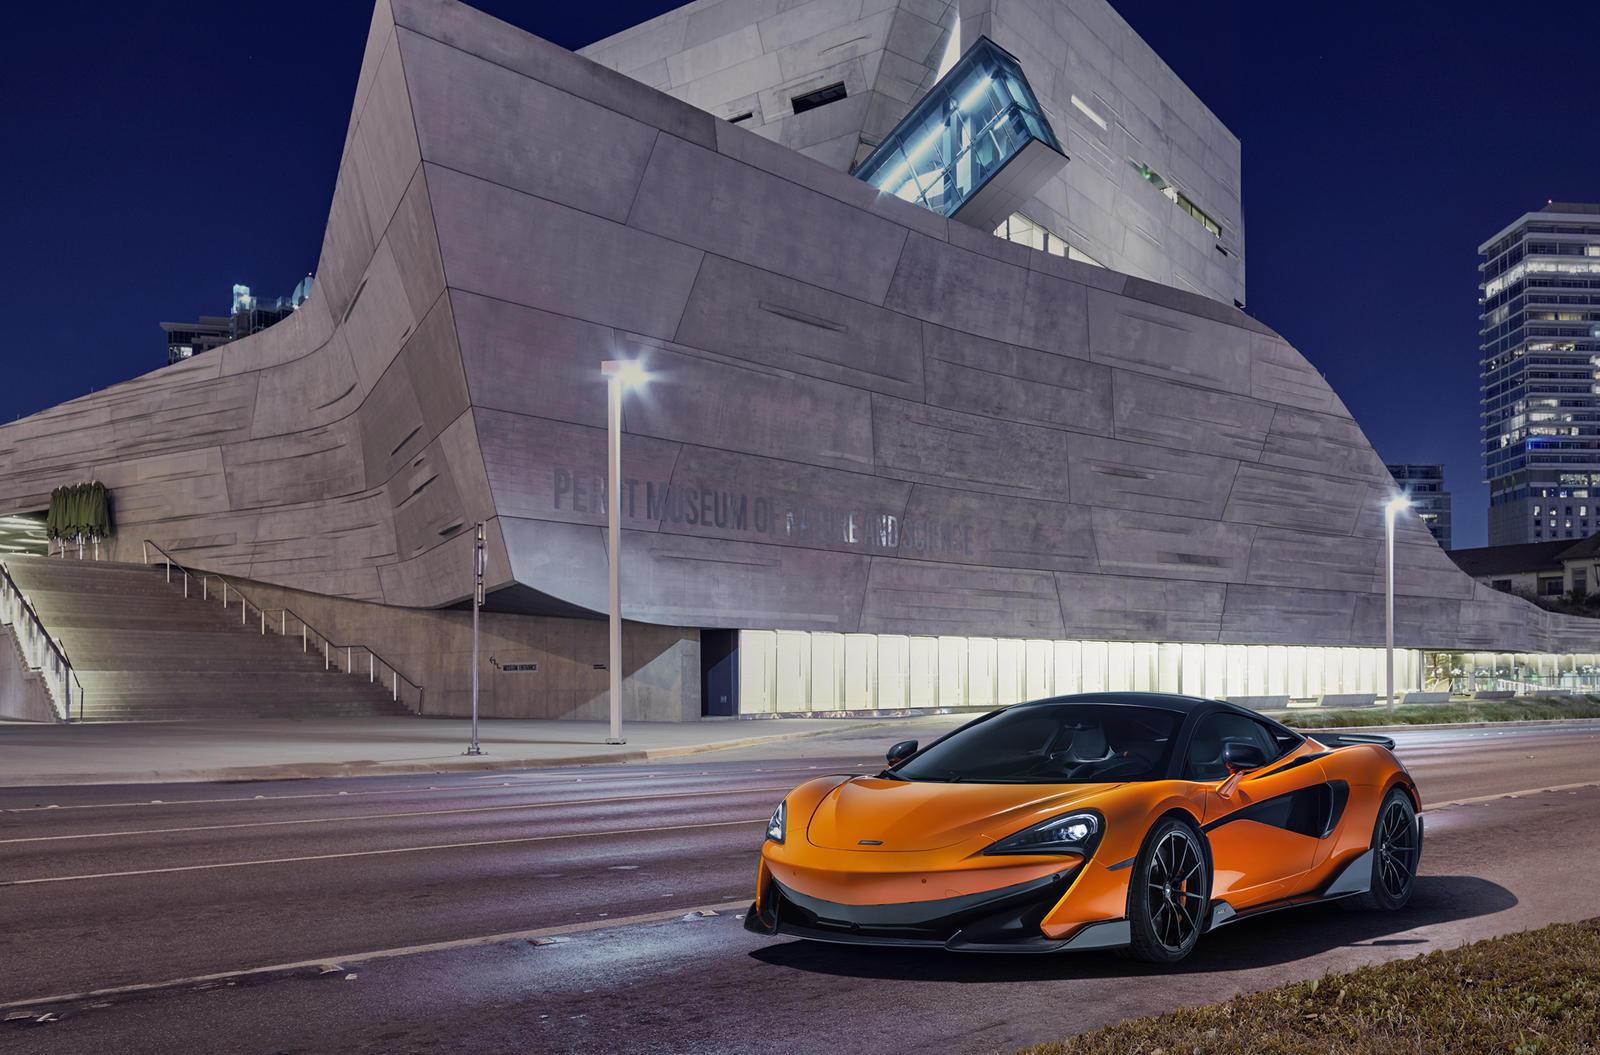 McLaren's New American Headquarters Is Going To Be Massive